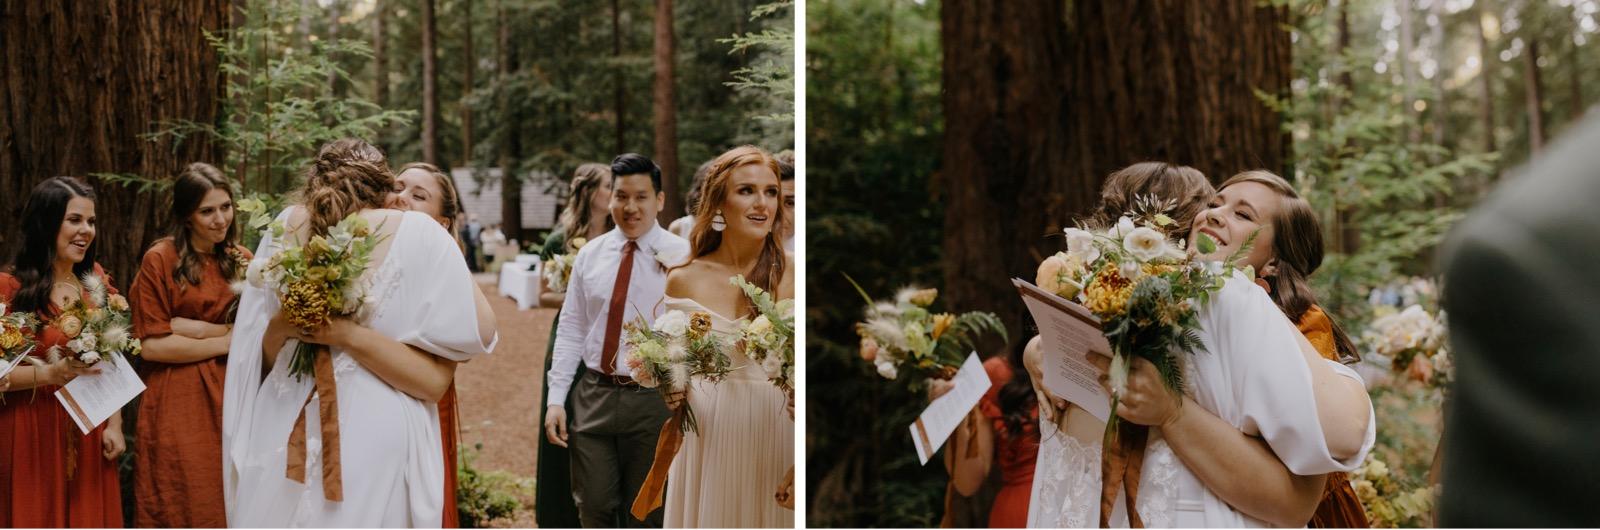 086_E&J 04173_E&J 04189_the-waterfall-lodge_forest_wedding_ben-lomond_intimate